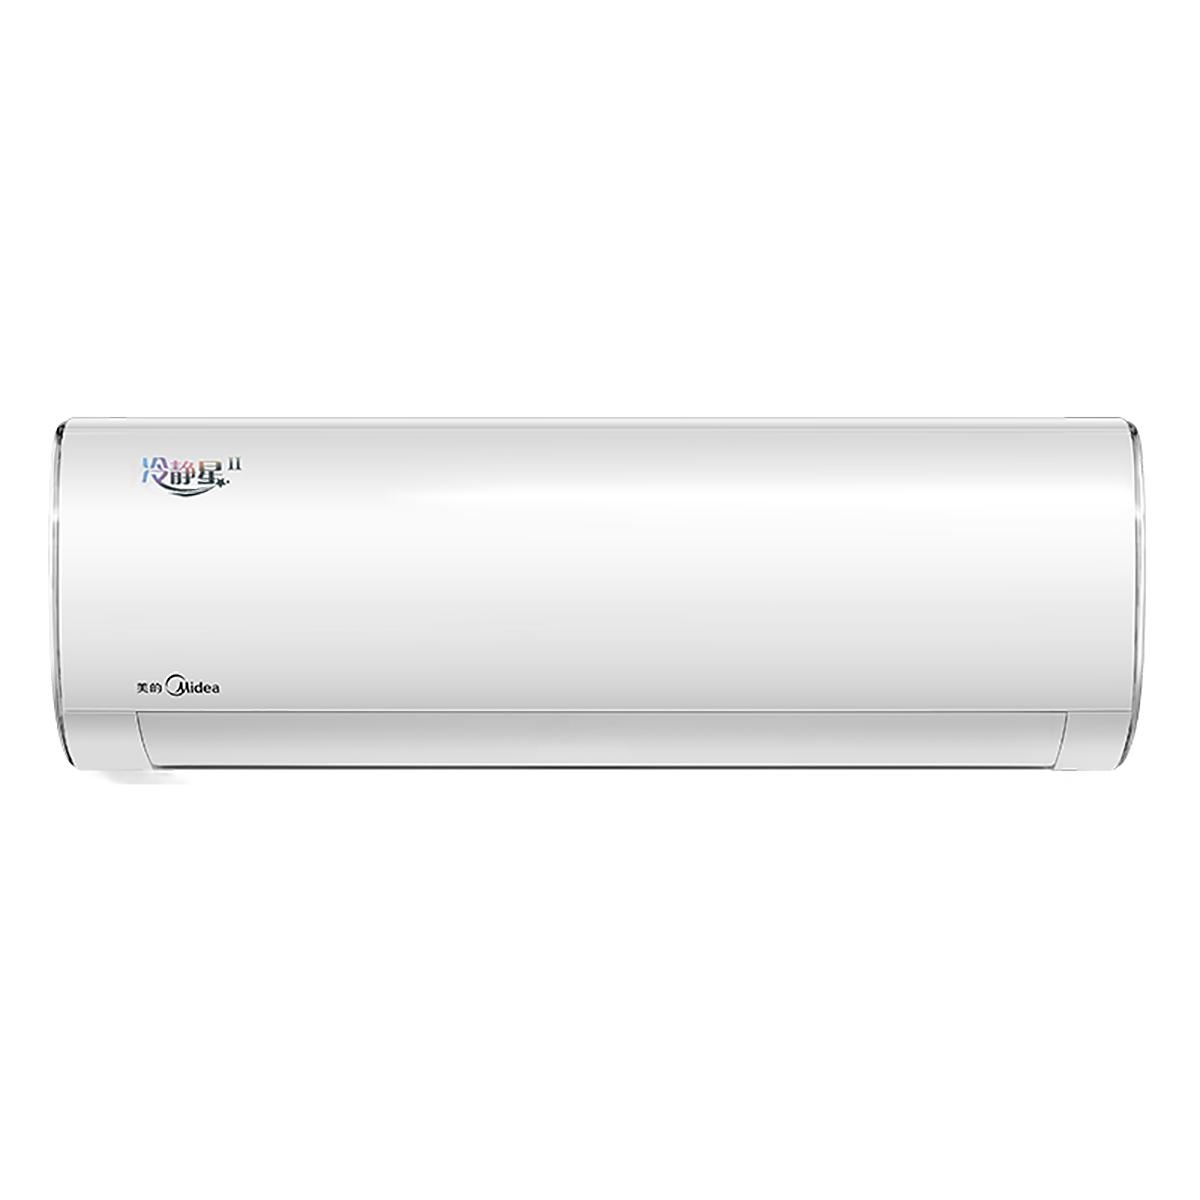 Midea/美的 KFR-35GW/BP2DN8Y-PH400(B3) 家用空调套机 说明书.pdf